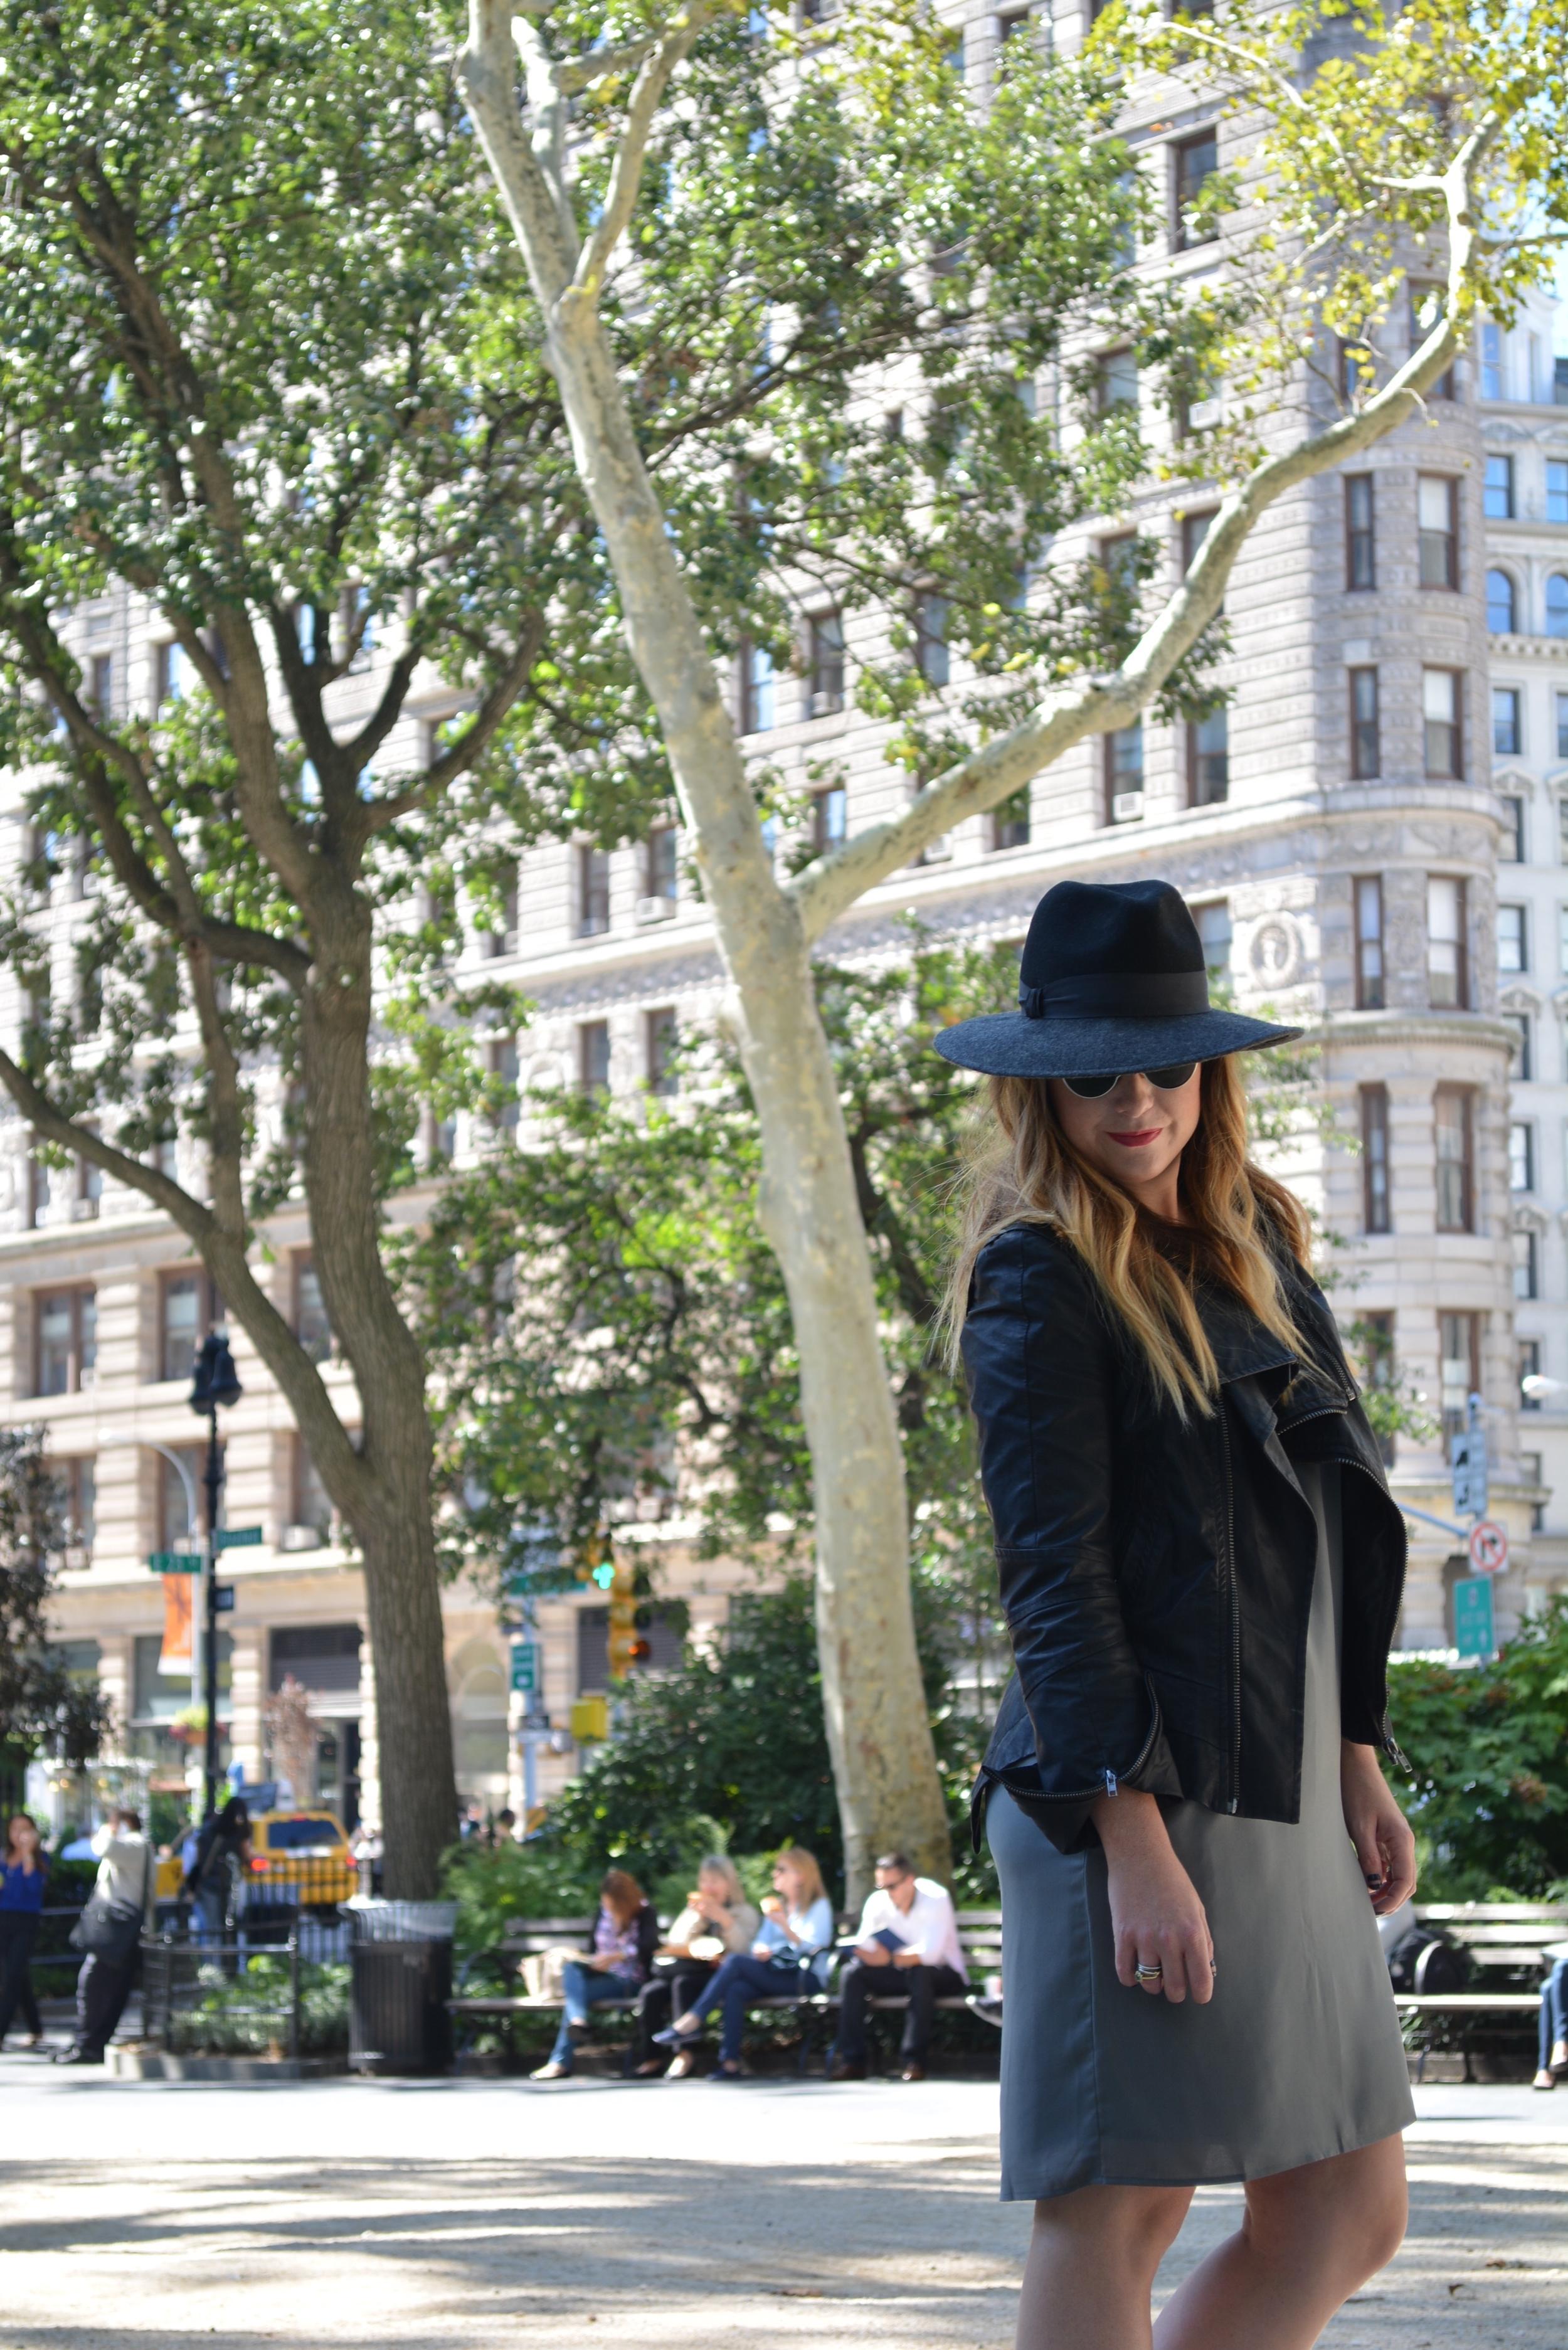 Wide brim hat, moto jacket, shift dress outfit